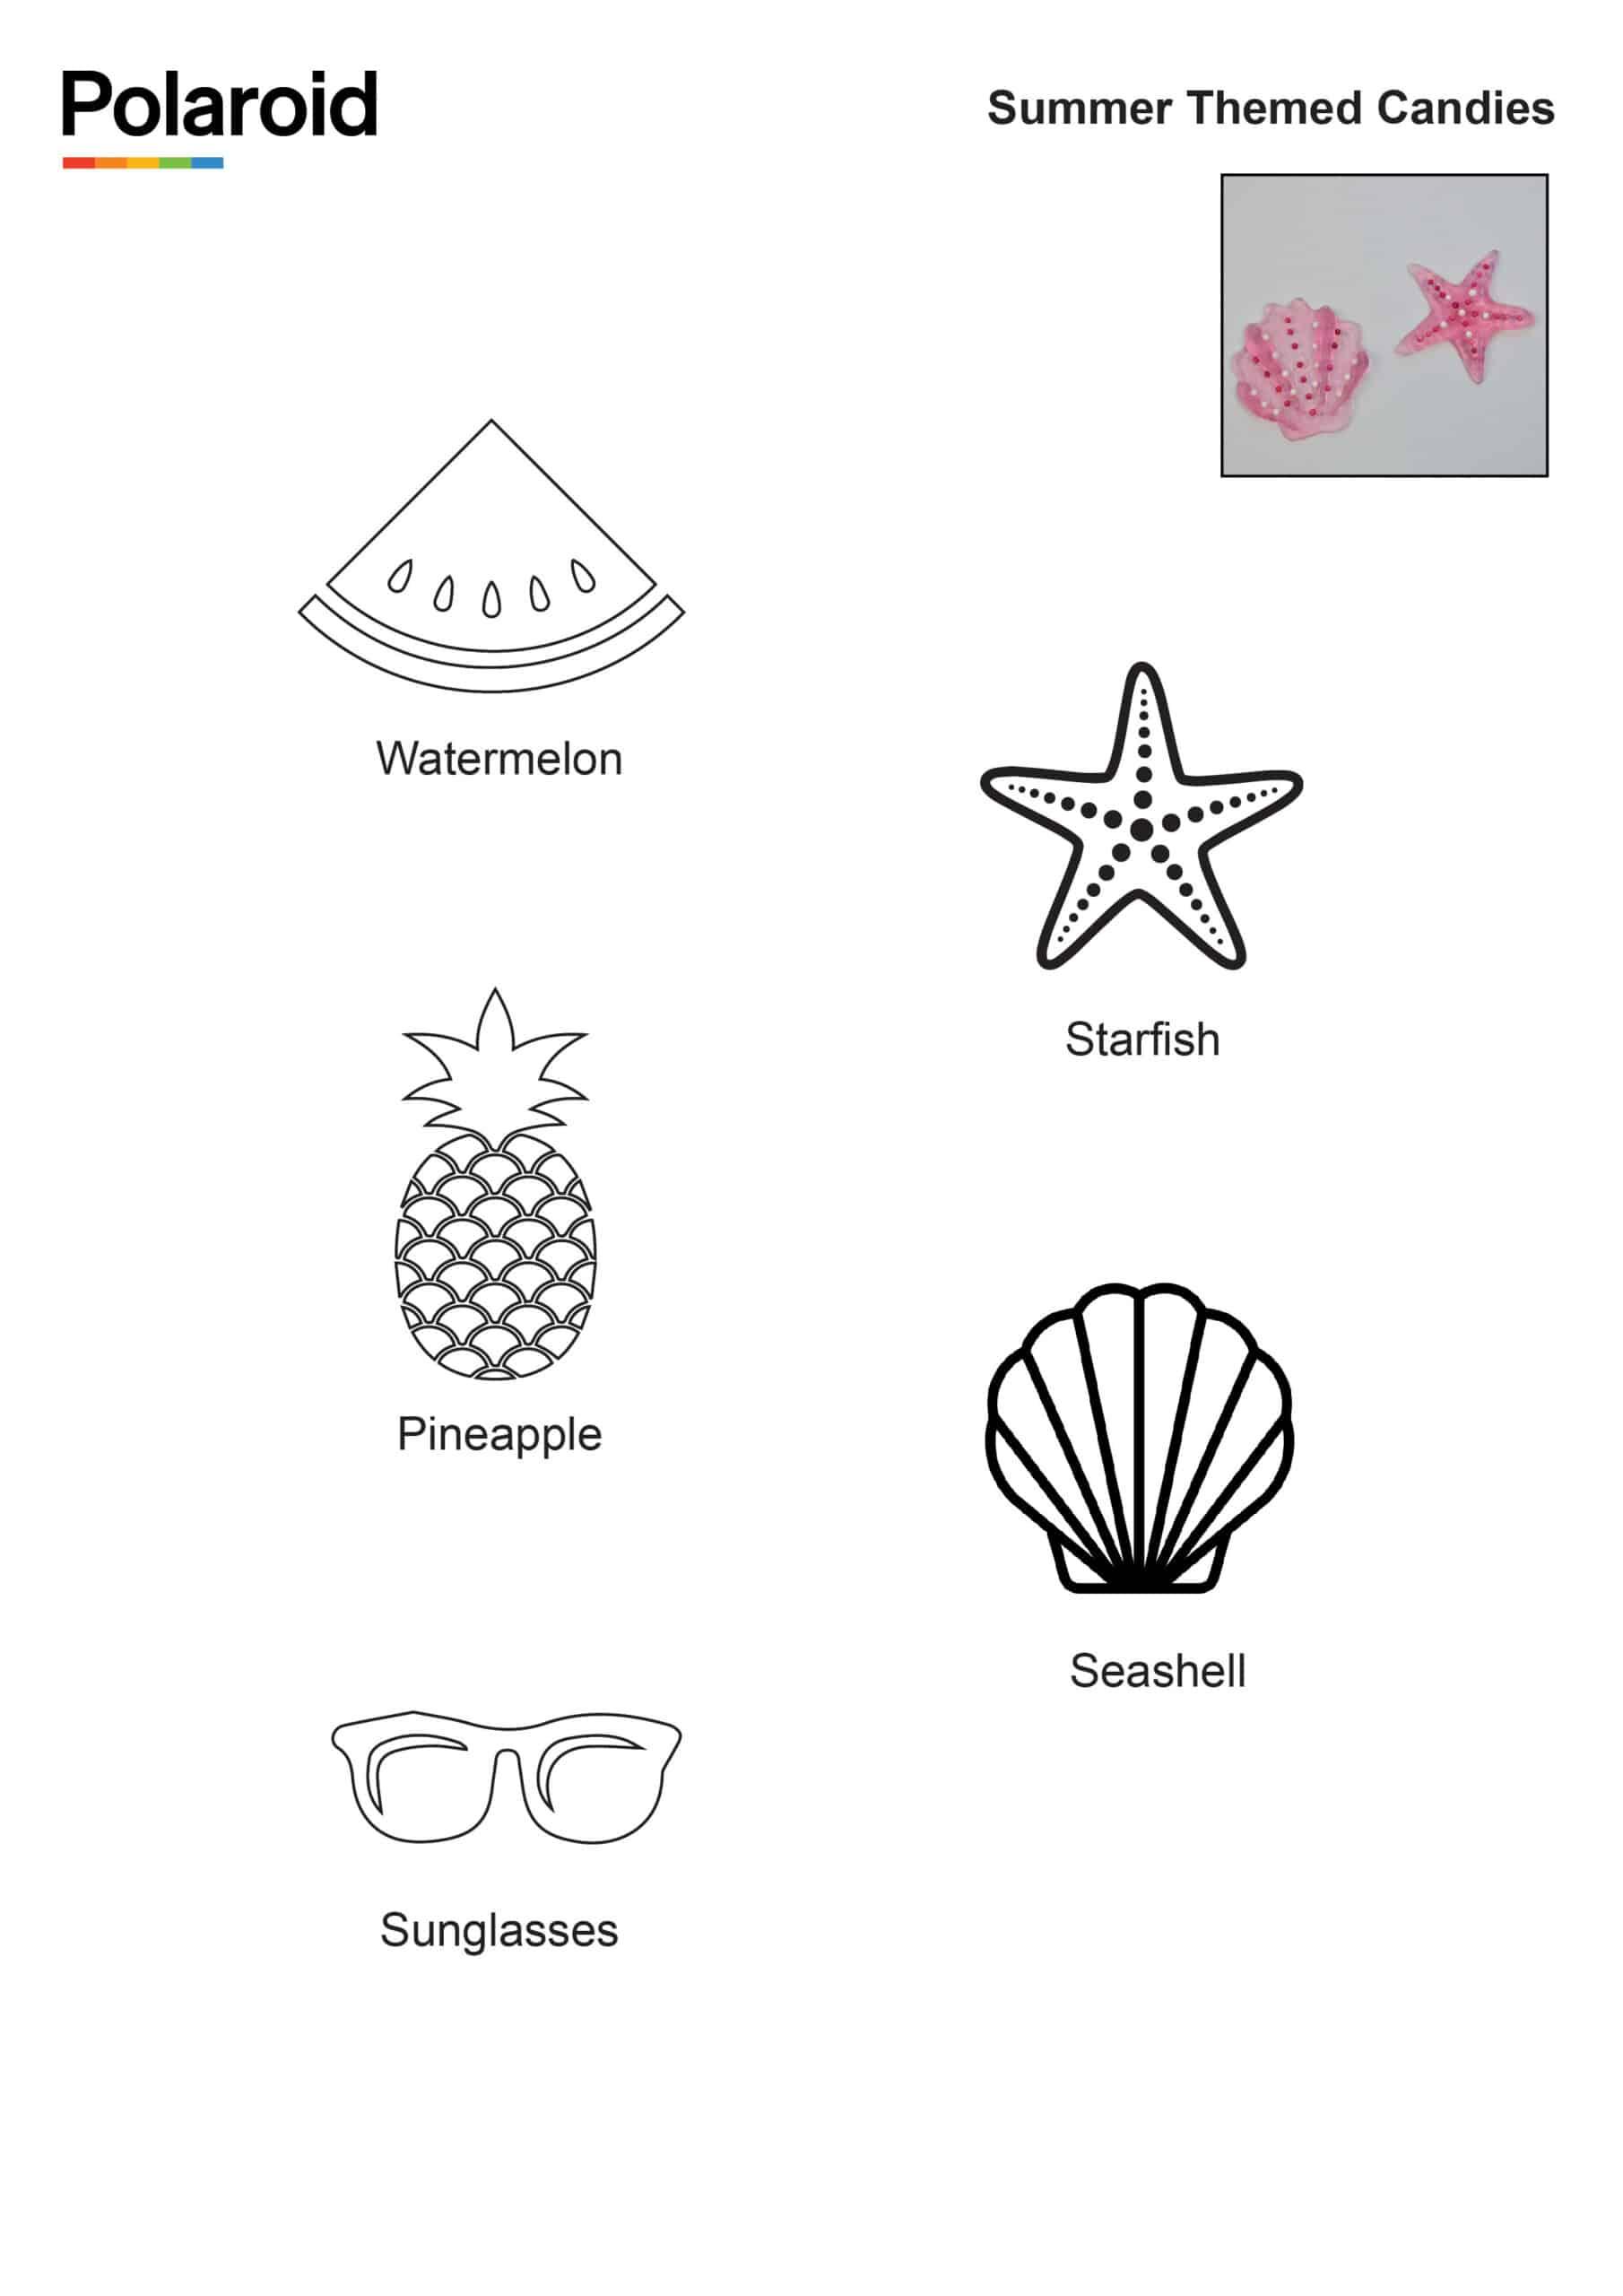 Candy Pen Stencil – Summer themed candies